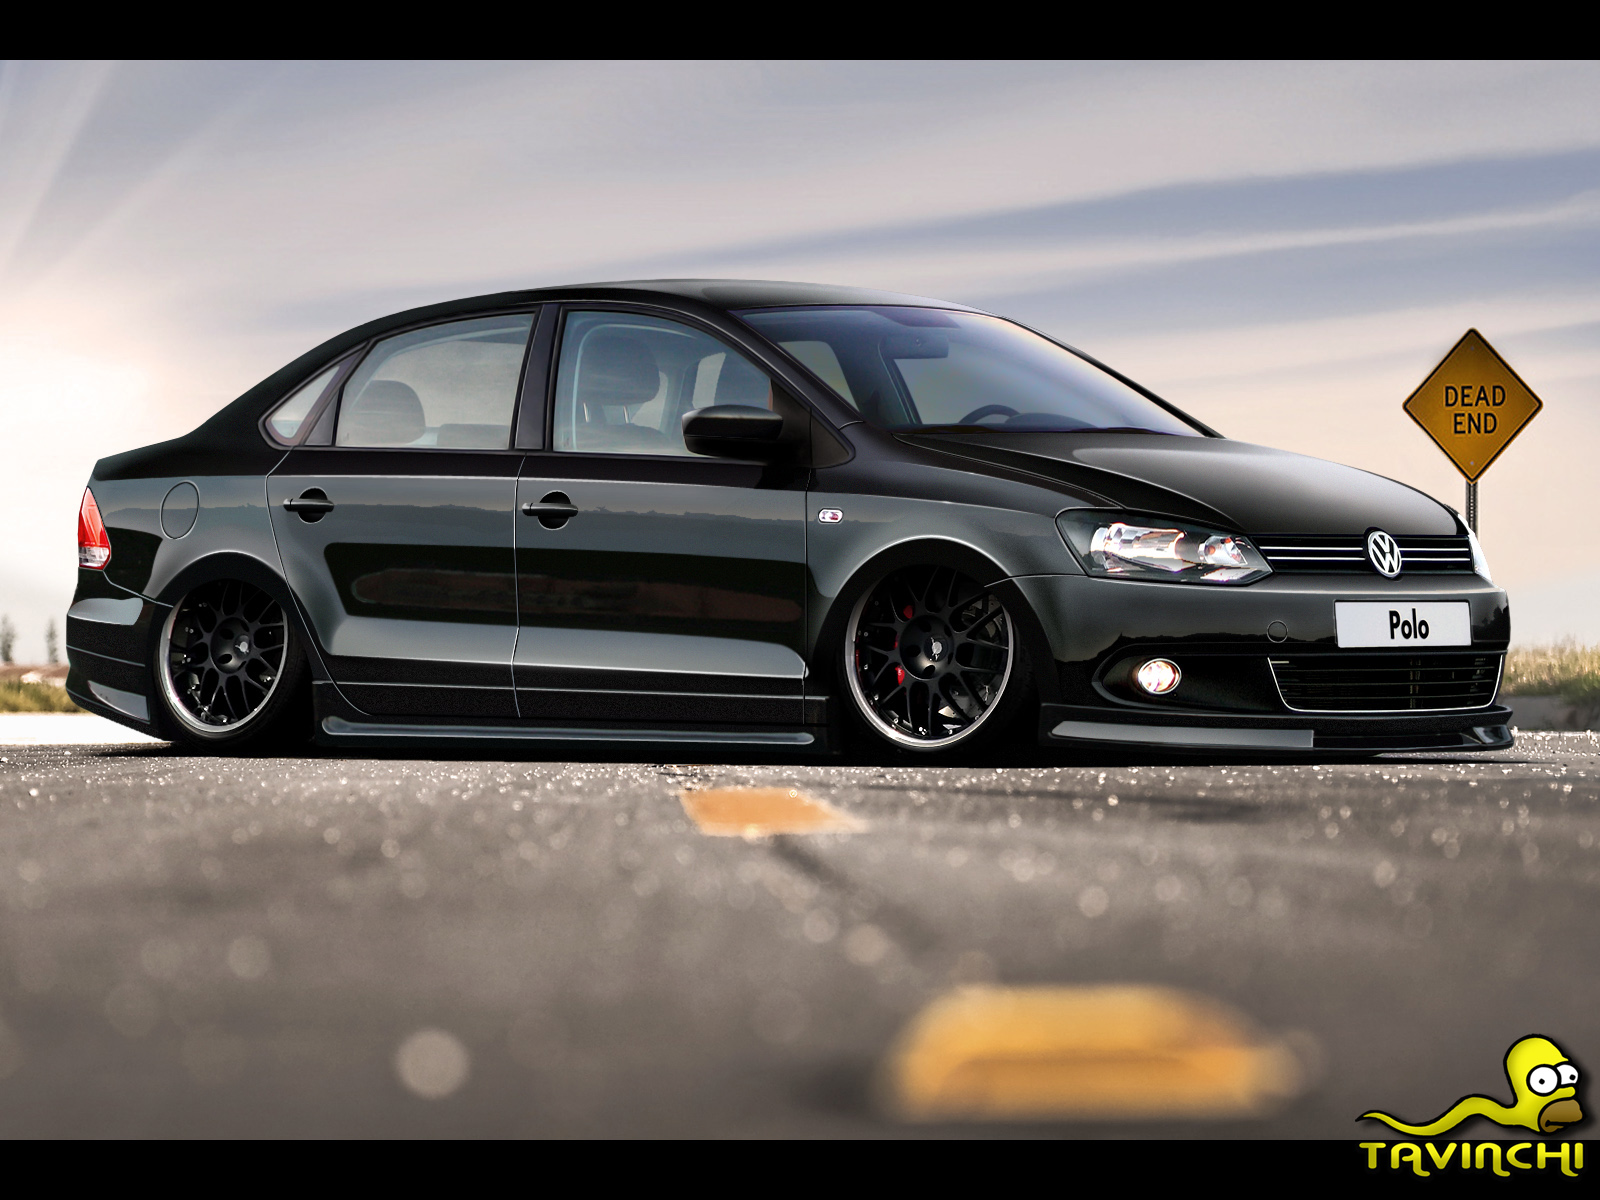 VW Polo Euro Look By Tavinchi